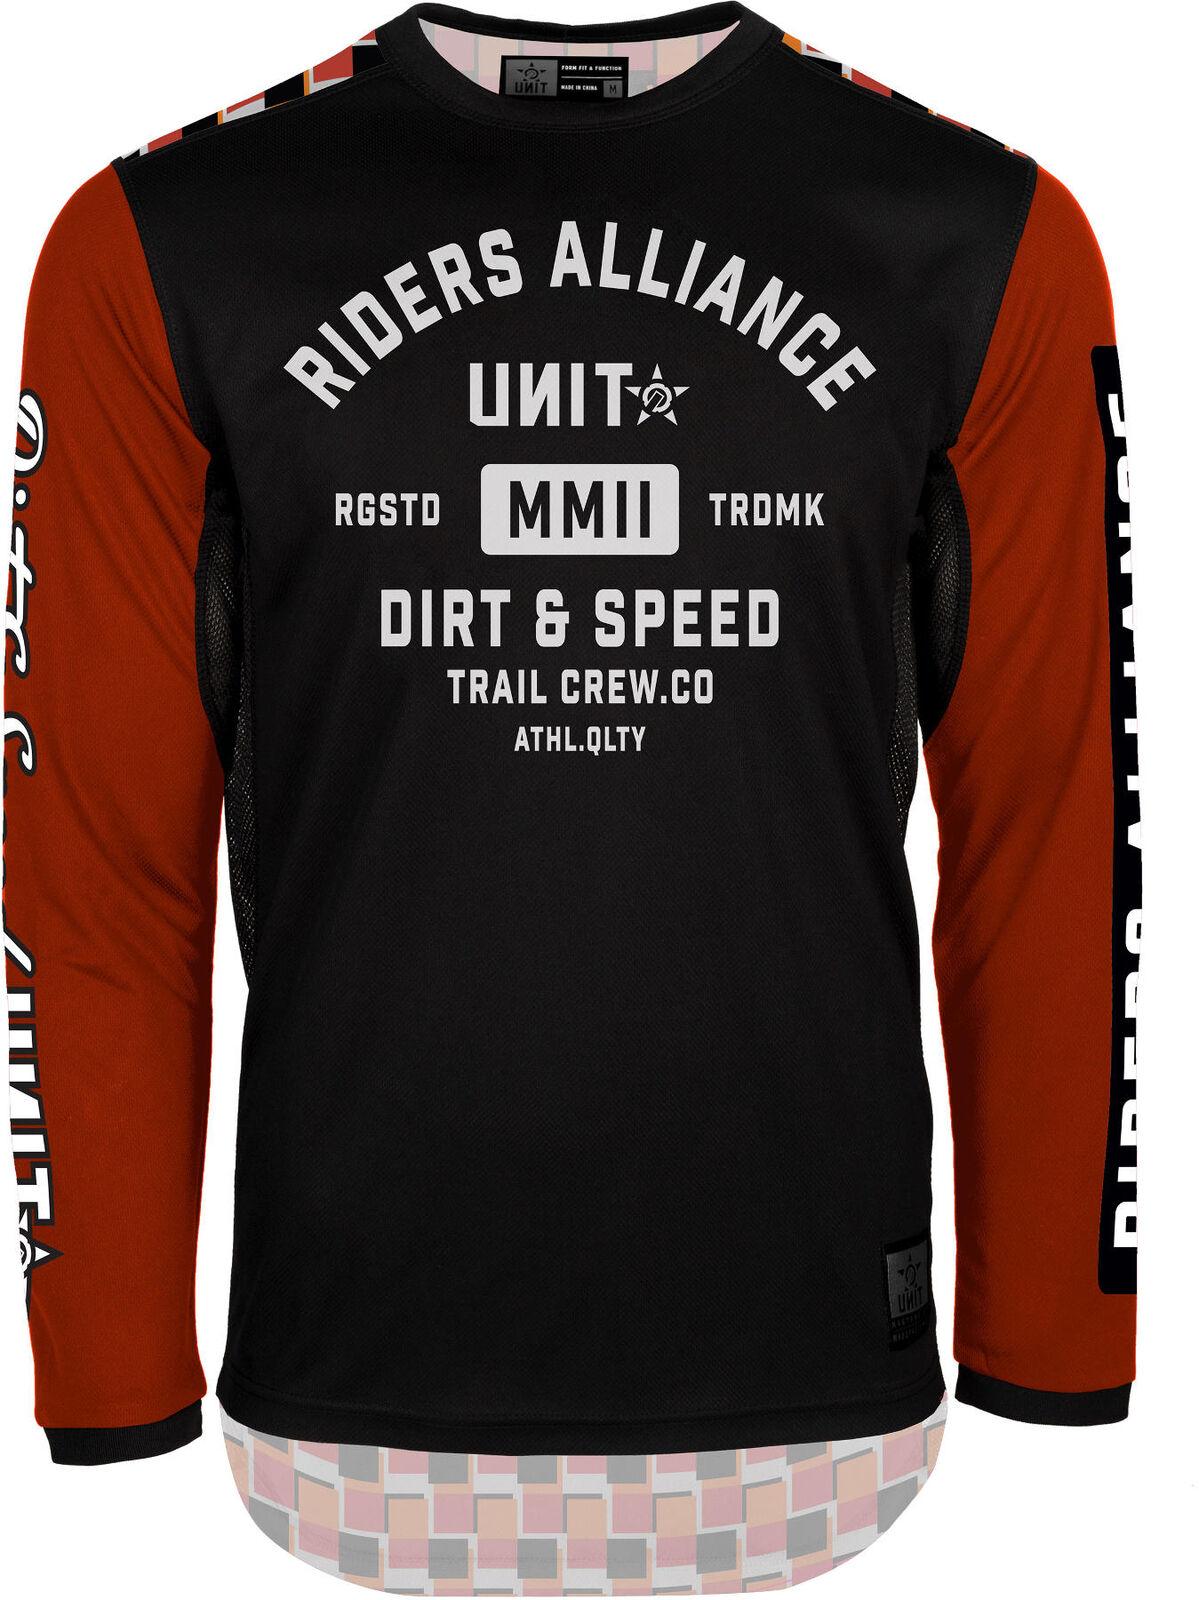 Unit Alliance LS MTB Bike Jersey orange 2019